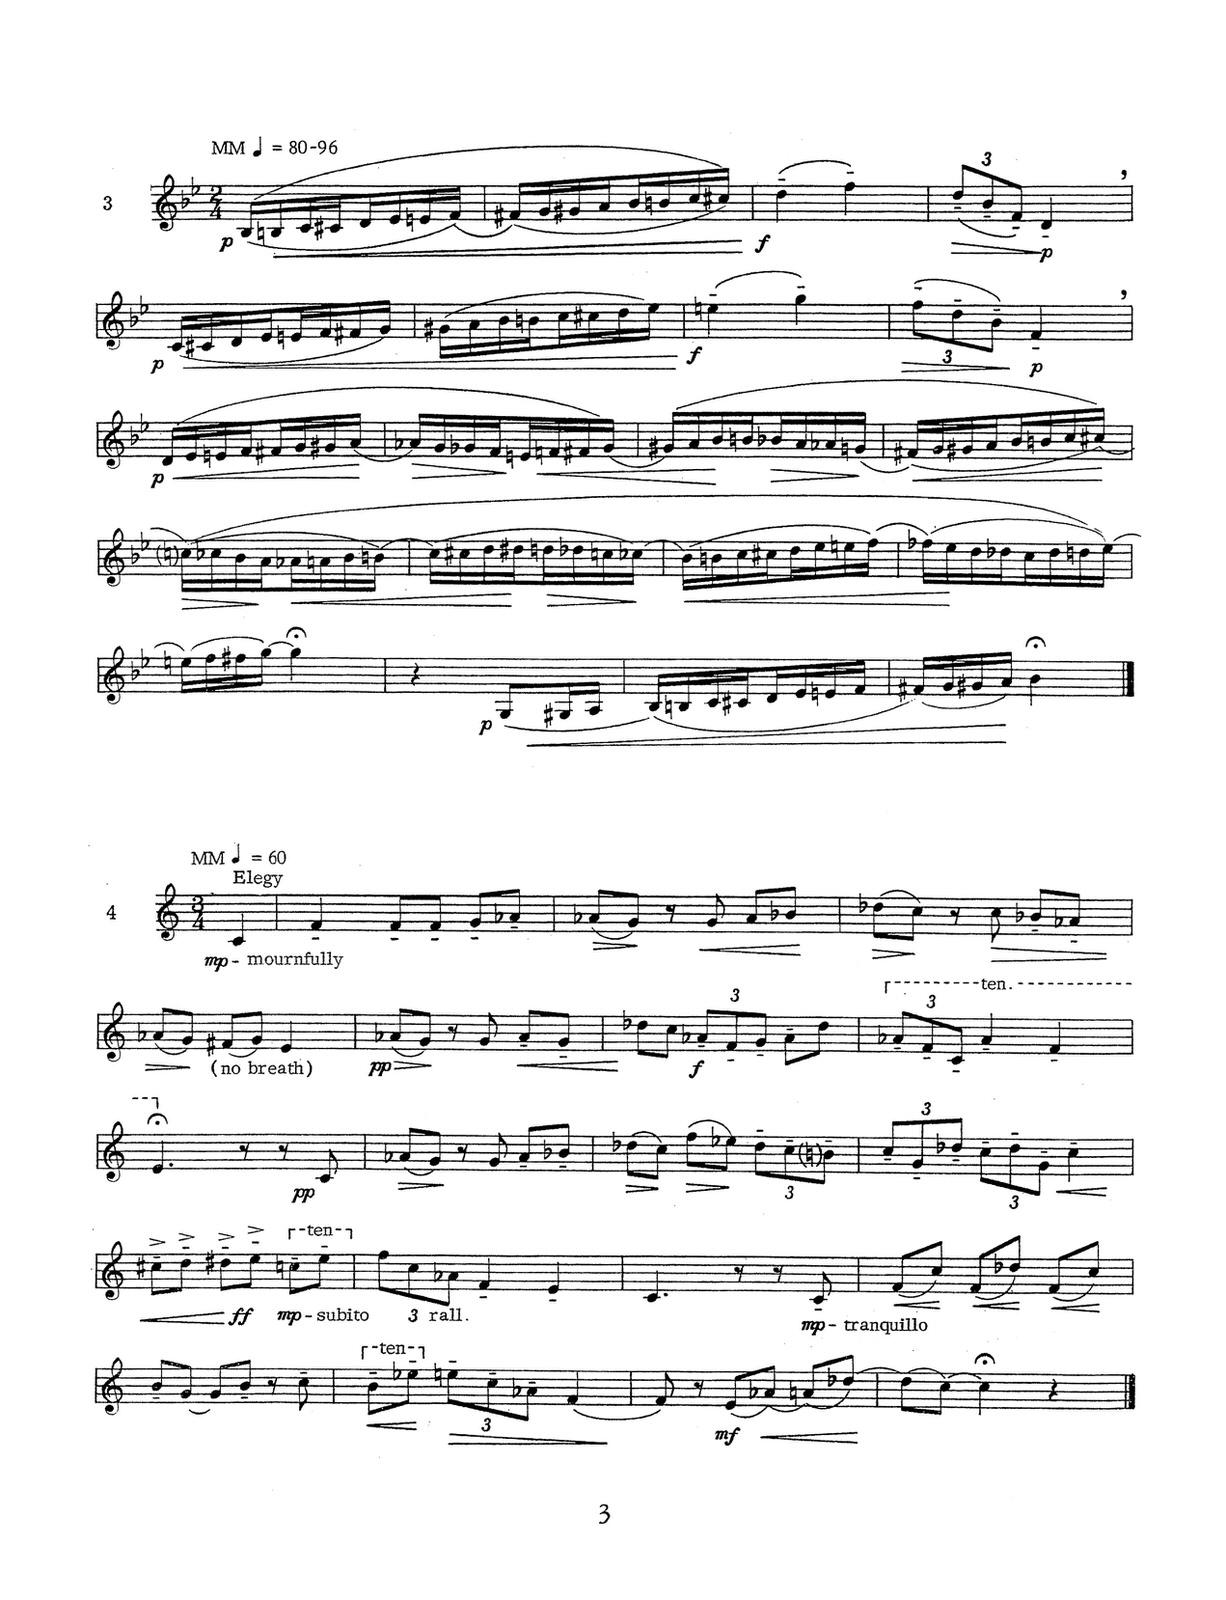 vanderwoude-pre-virtuoso-studies-3